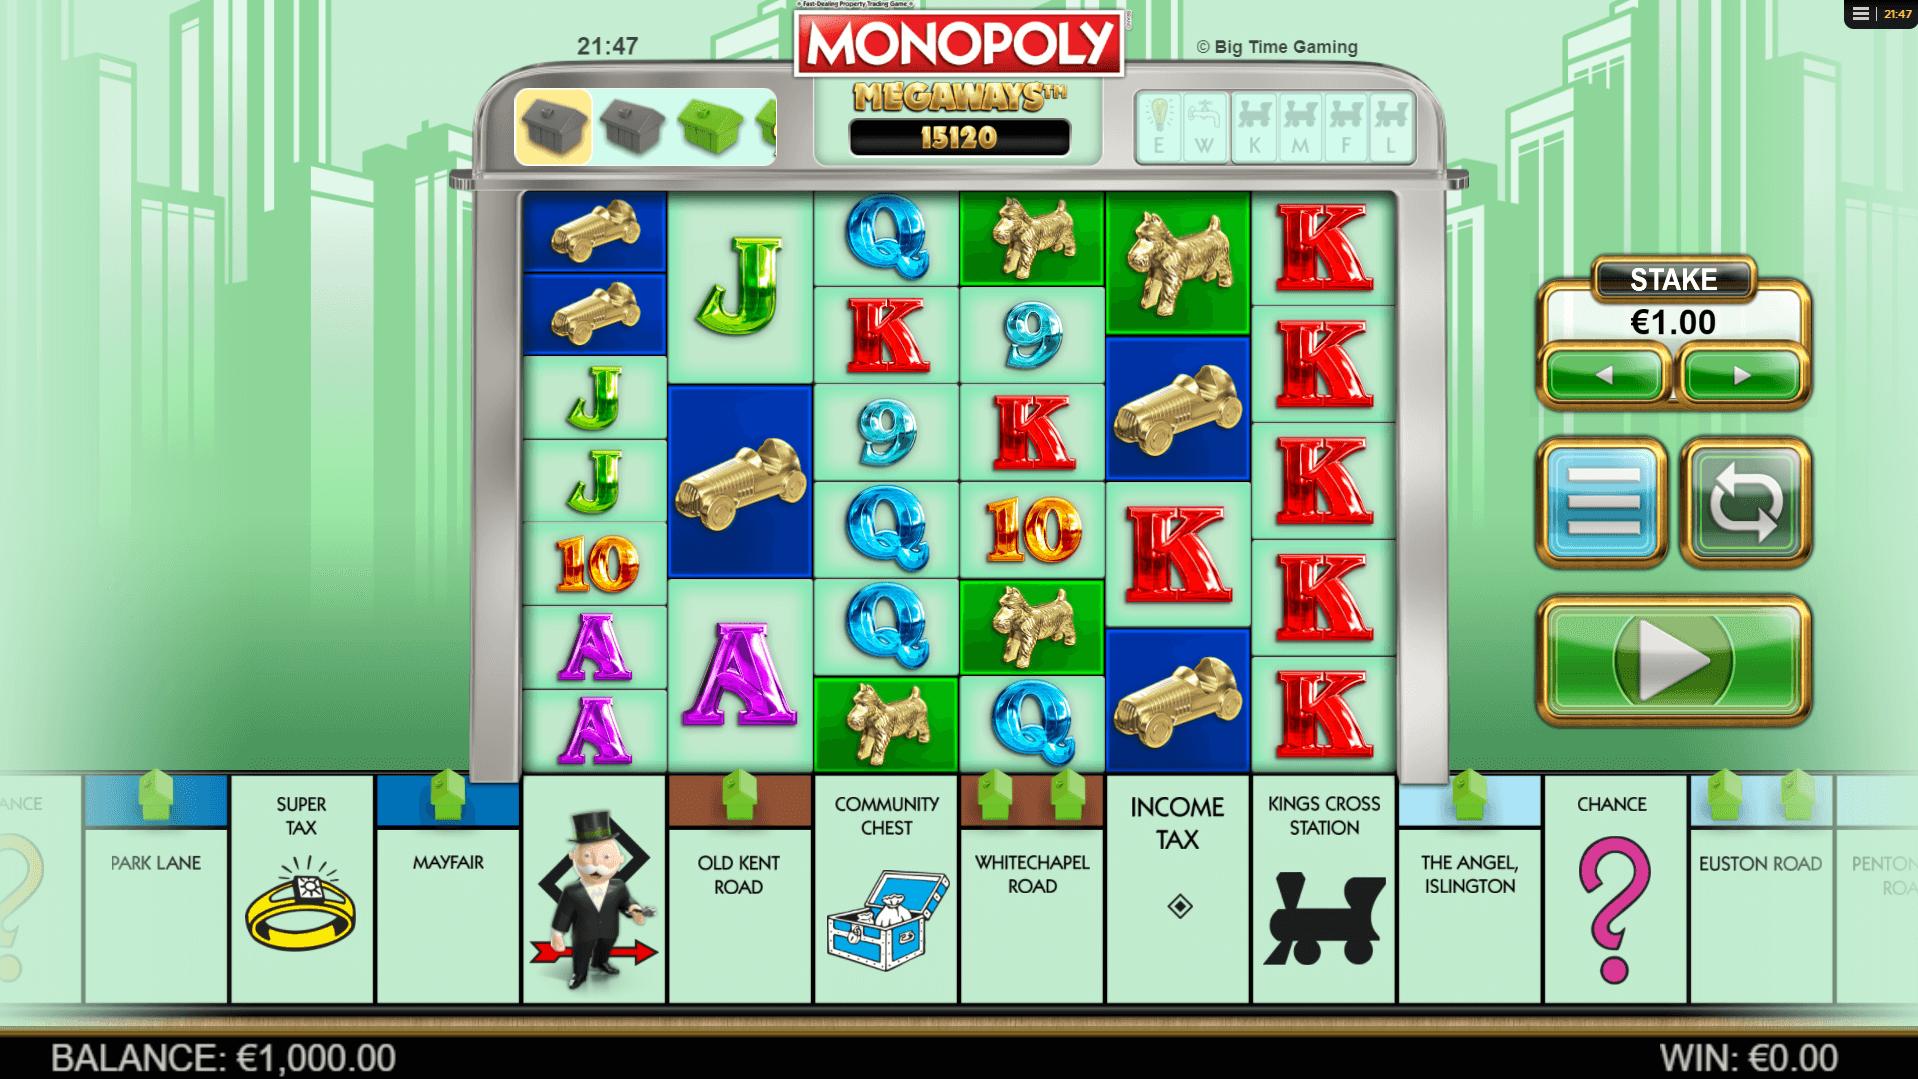 Monopoly Megaways slot machine screenshot